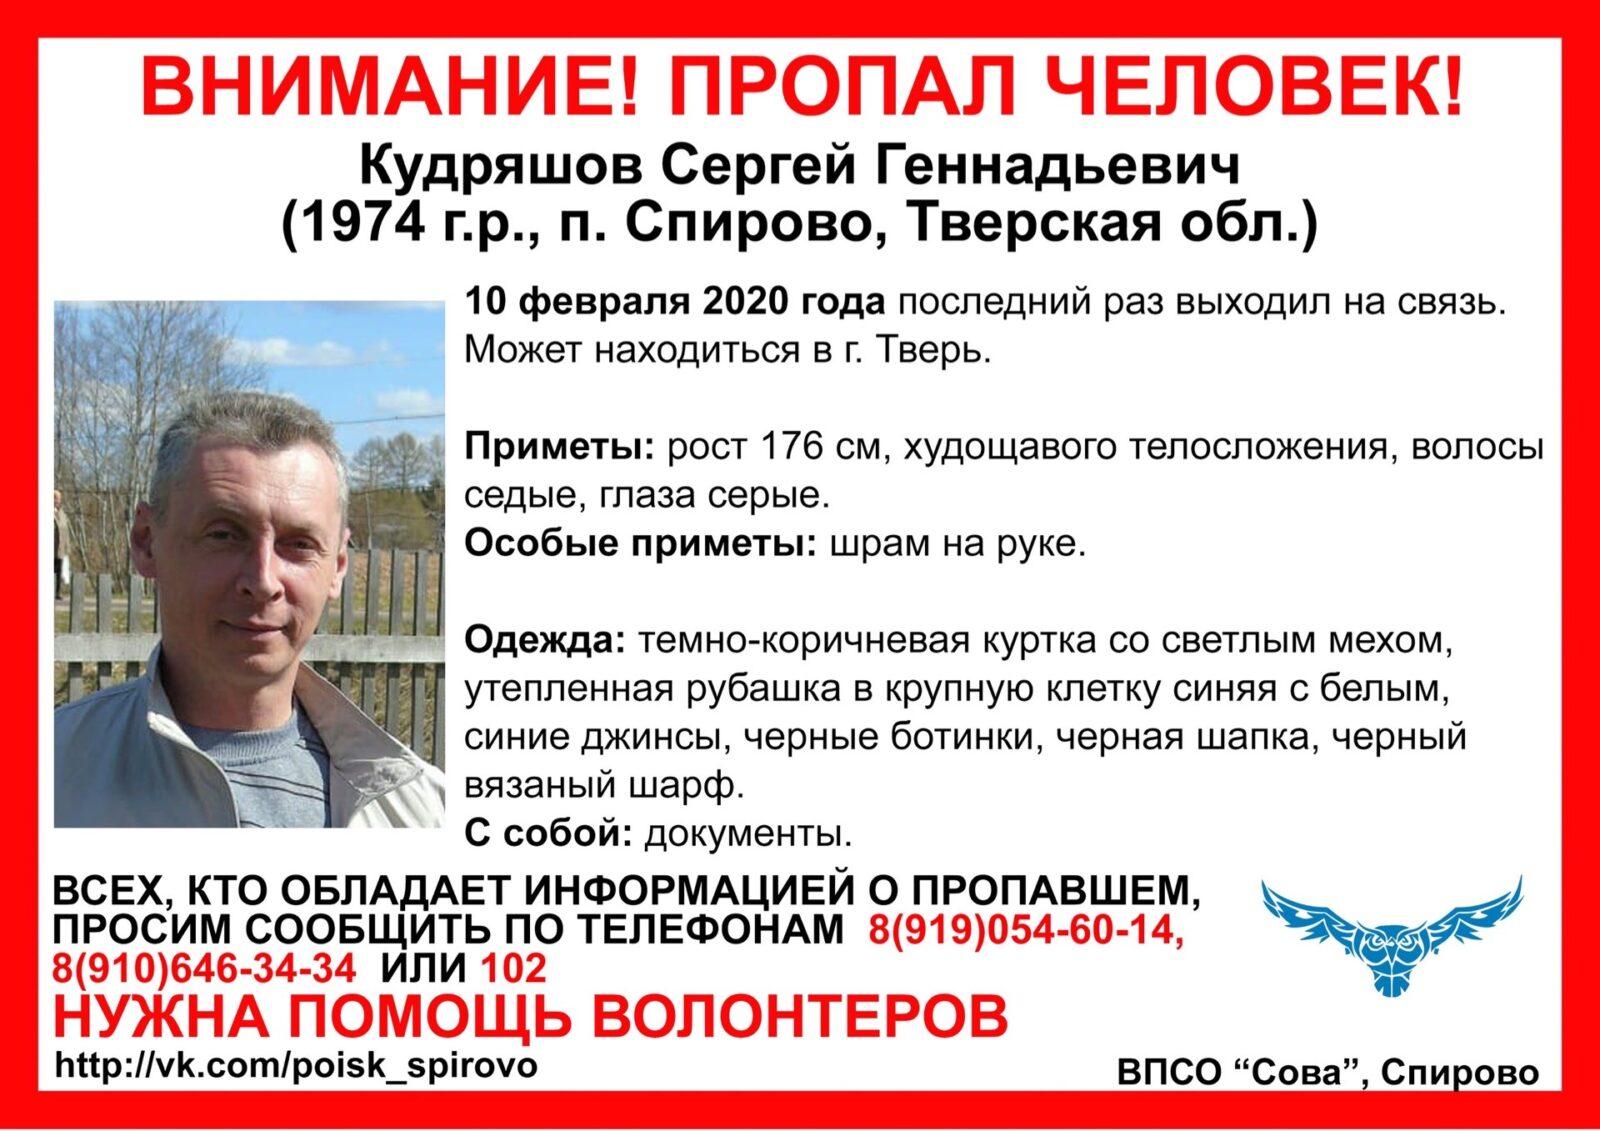 В Тверской области пропал мужчина со шрамом на руке